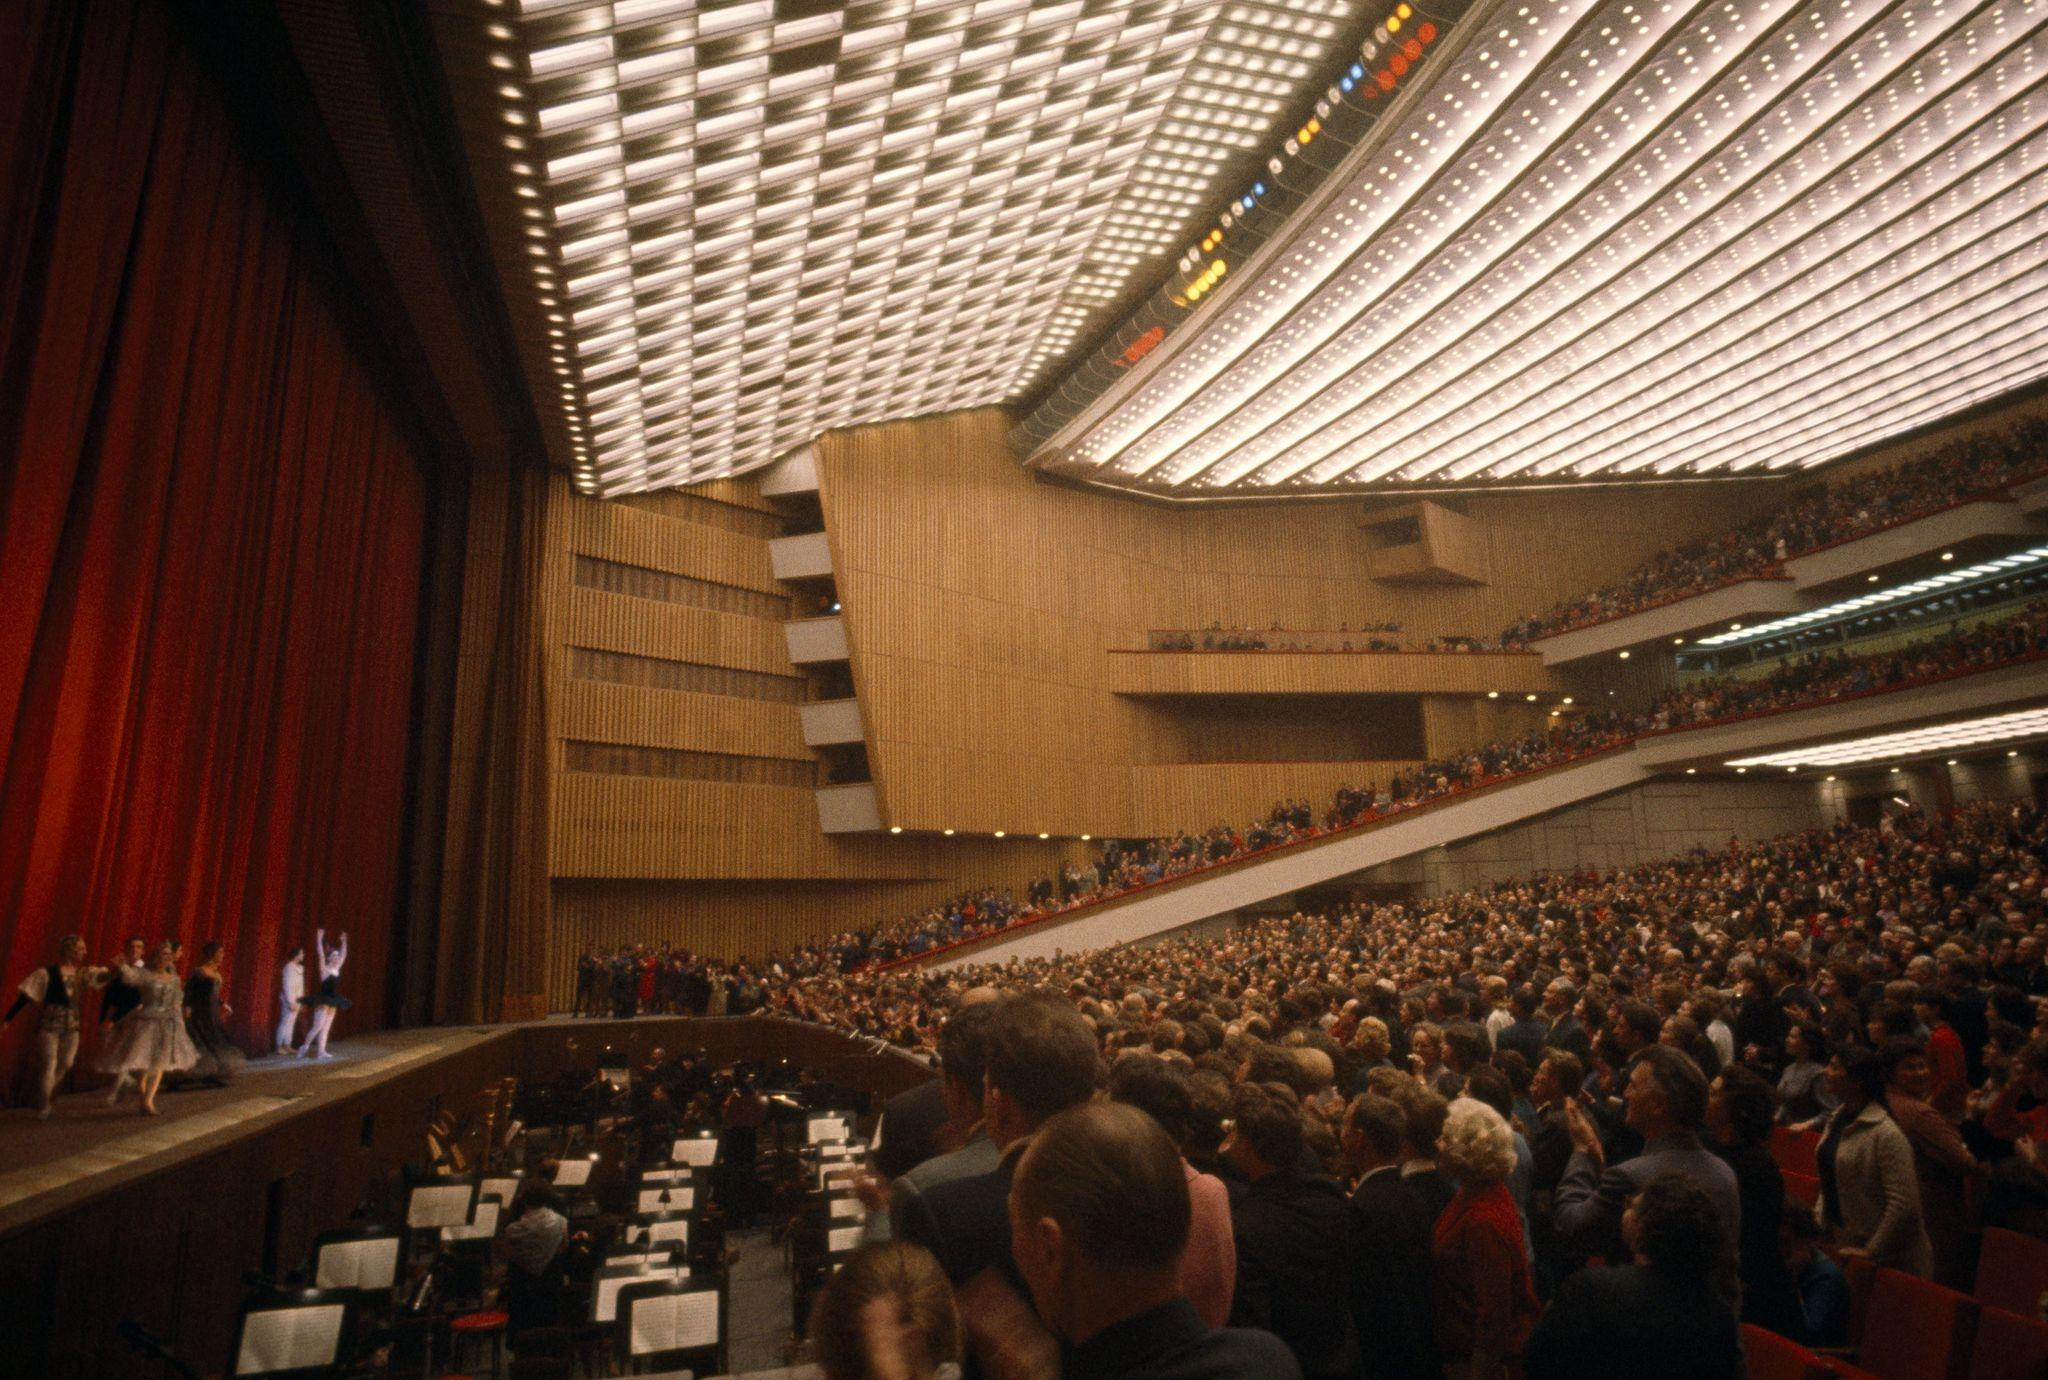 1964. Артисты балета кланяются на сцене, а зрители аплодируют стоя